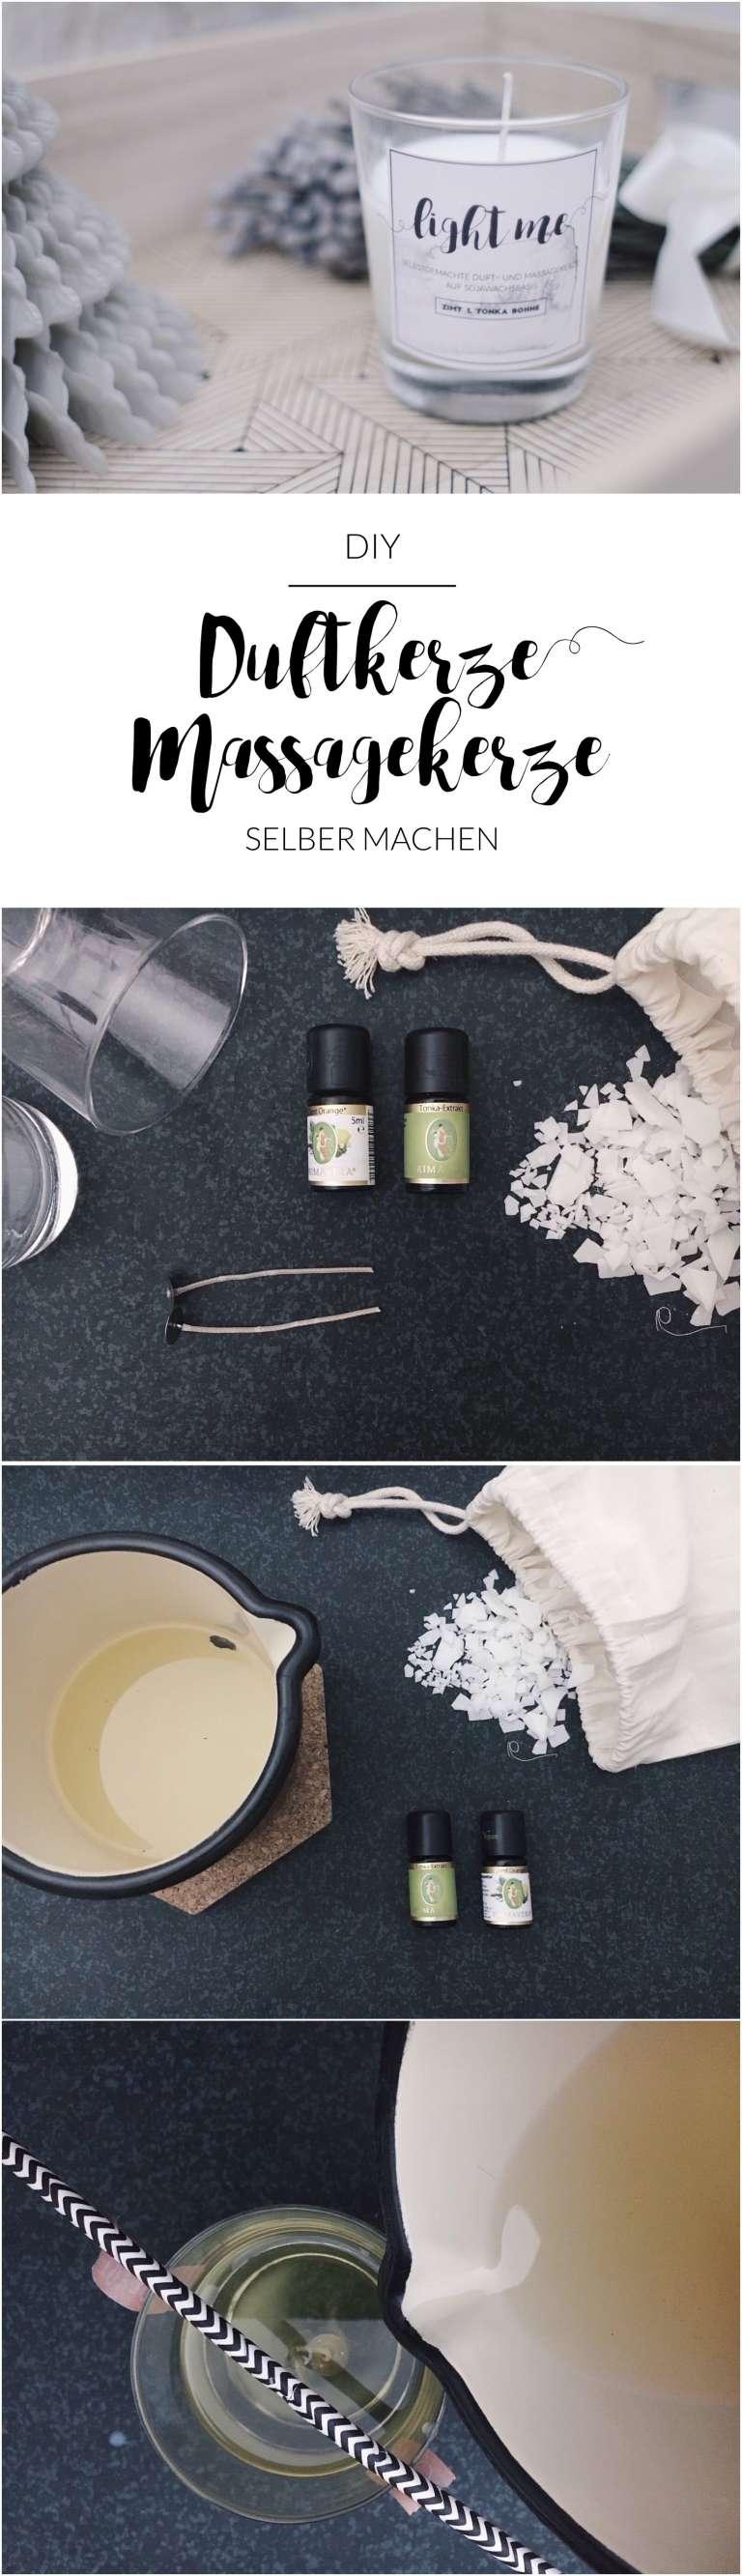 How To Duftkerzen Massagekerzen Selber Machen Geschenk Paulsvera